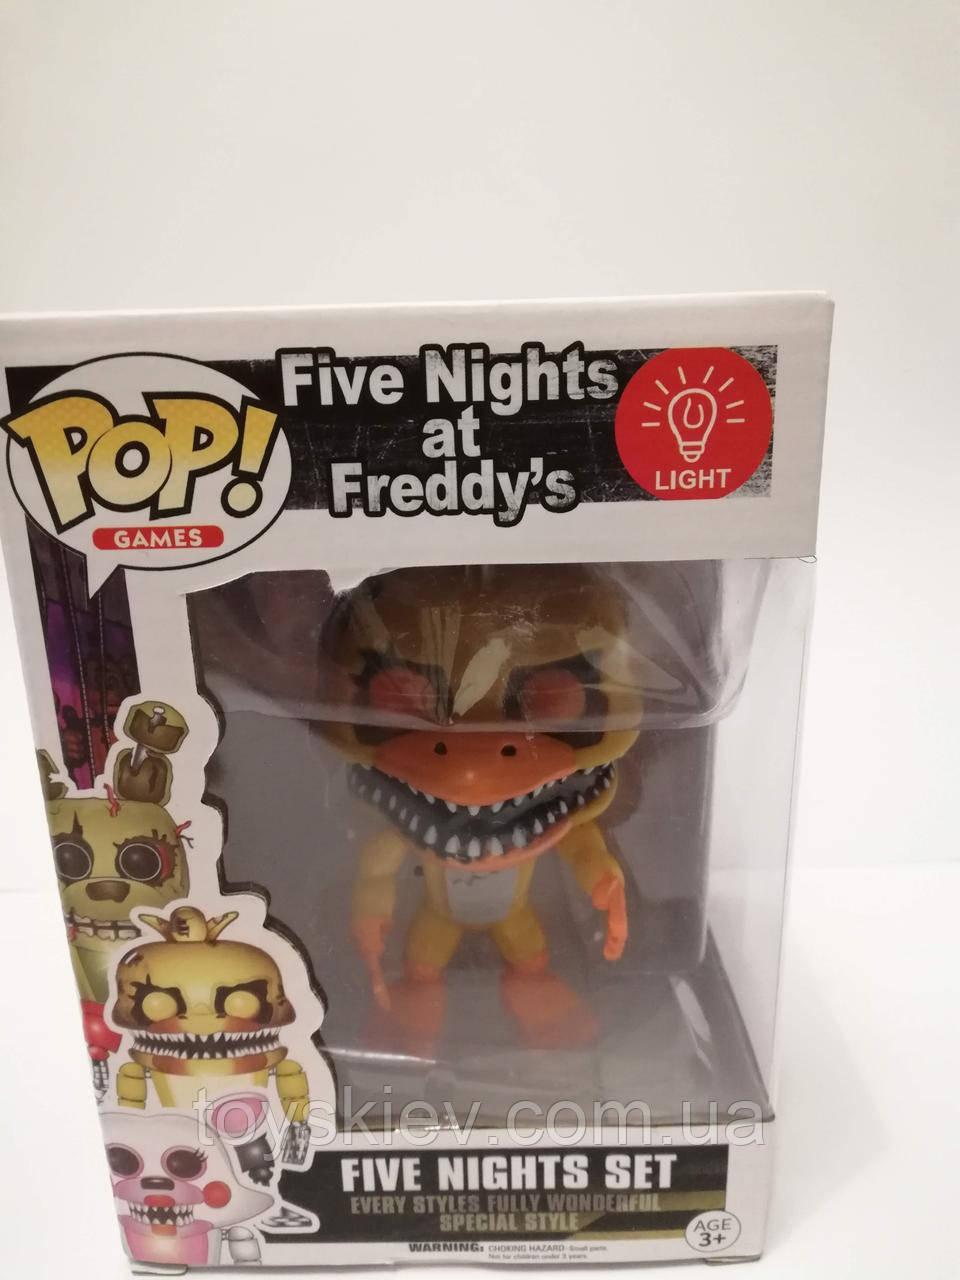 Игрушки 5 пять ночей с Фредди, Фредди / Funko Five Nights at Freddy's, Freddy 2011-1 свет эффекты.